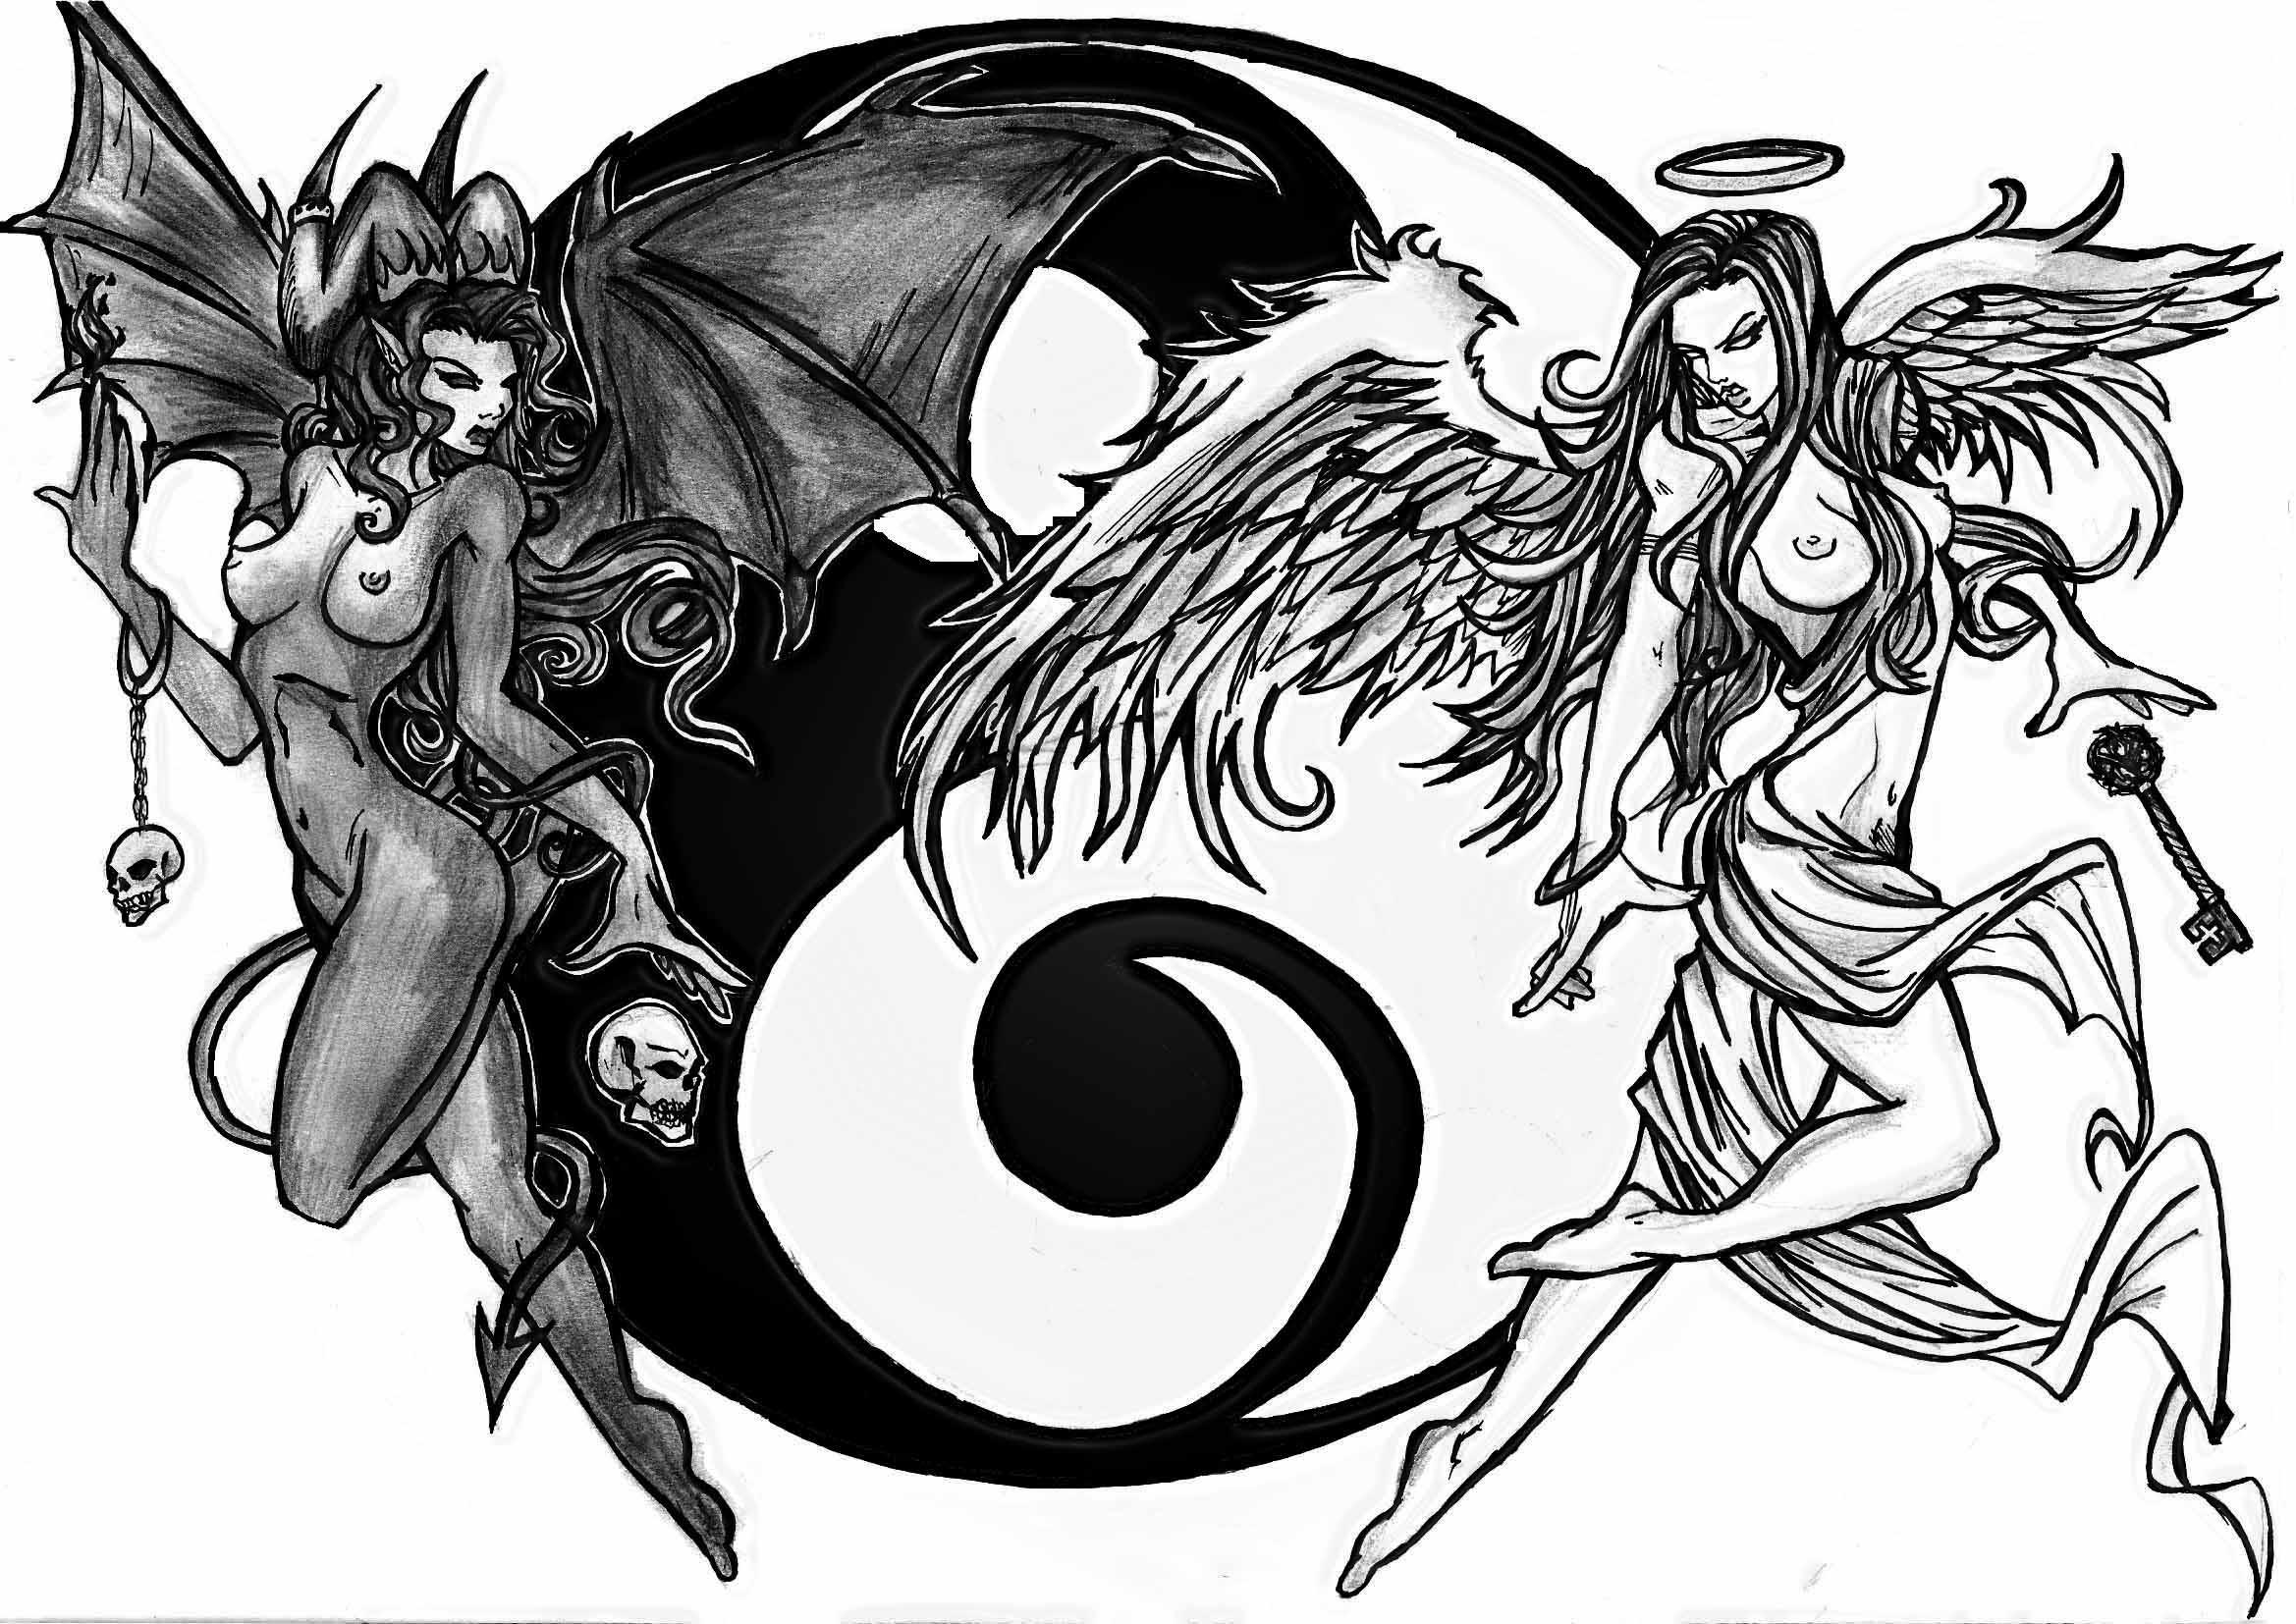 4f223221b Ying Yang Drawing at GetDrawings.com | Free for personal use Ying ...